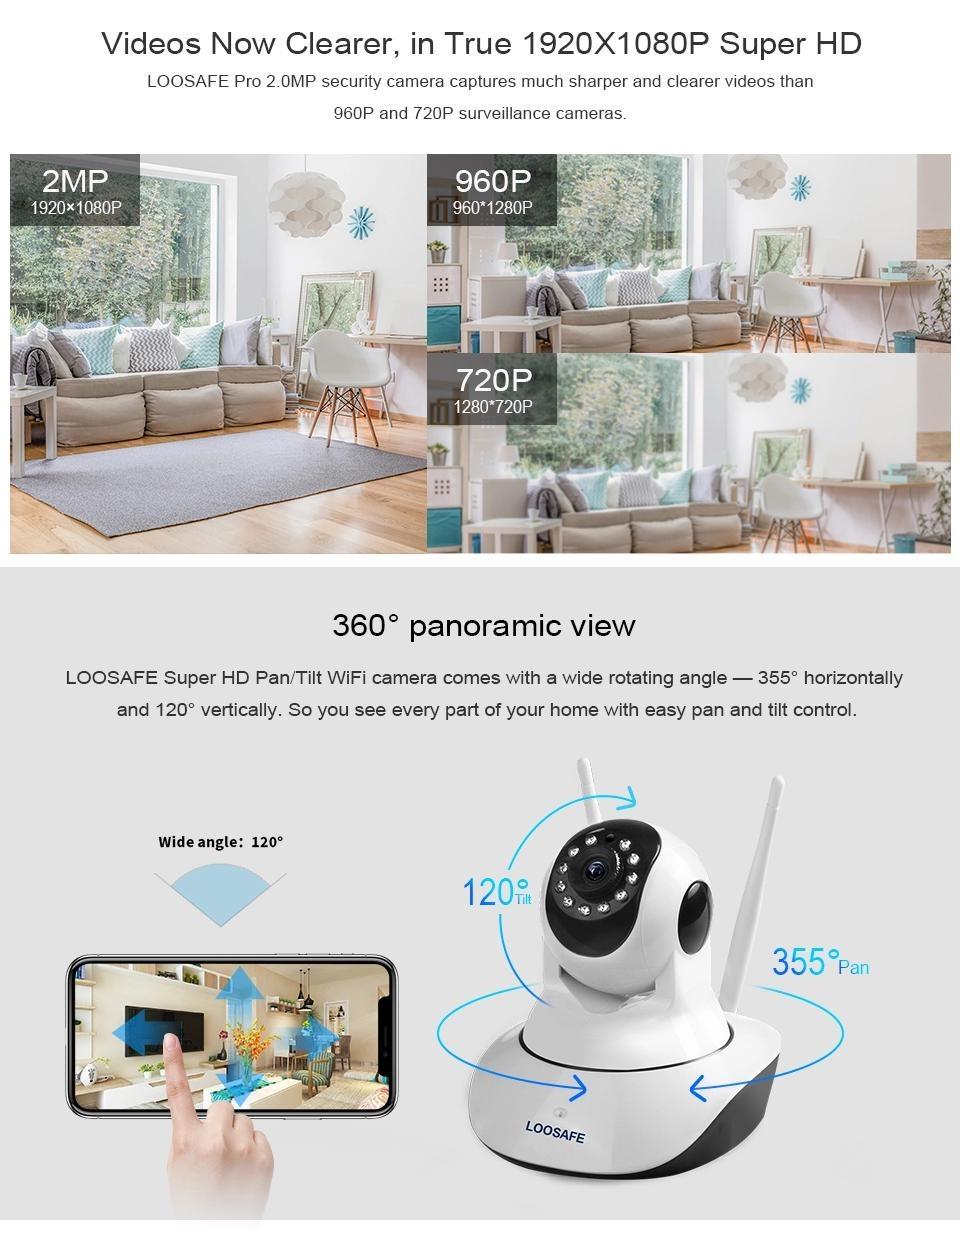 i.ibb.co/vDsJ2xy/C-mera-de-Seguran-a-CCTV-P2-P-2-MP-IP-1080-P-Wi-fi-Baby-Monitor-LS-F2-6.jpg